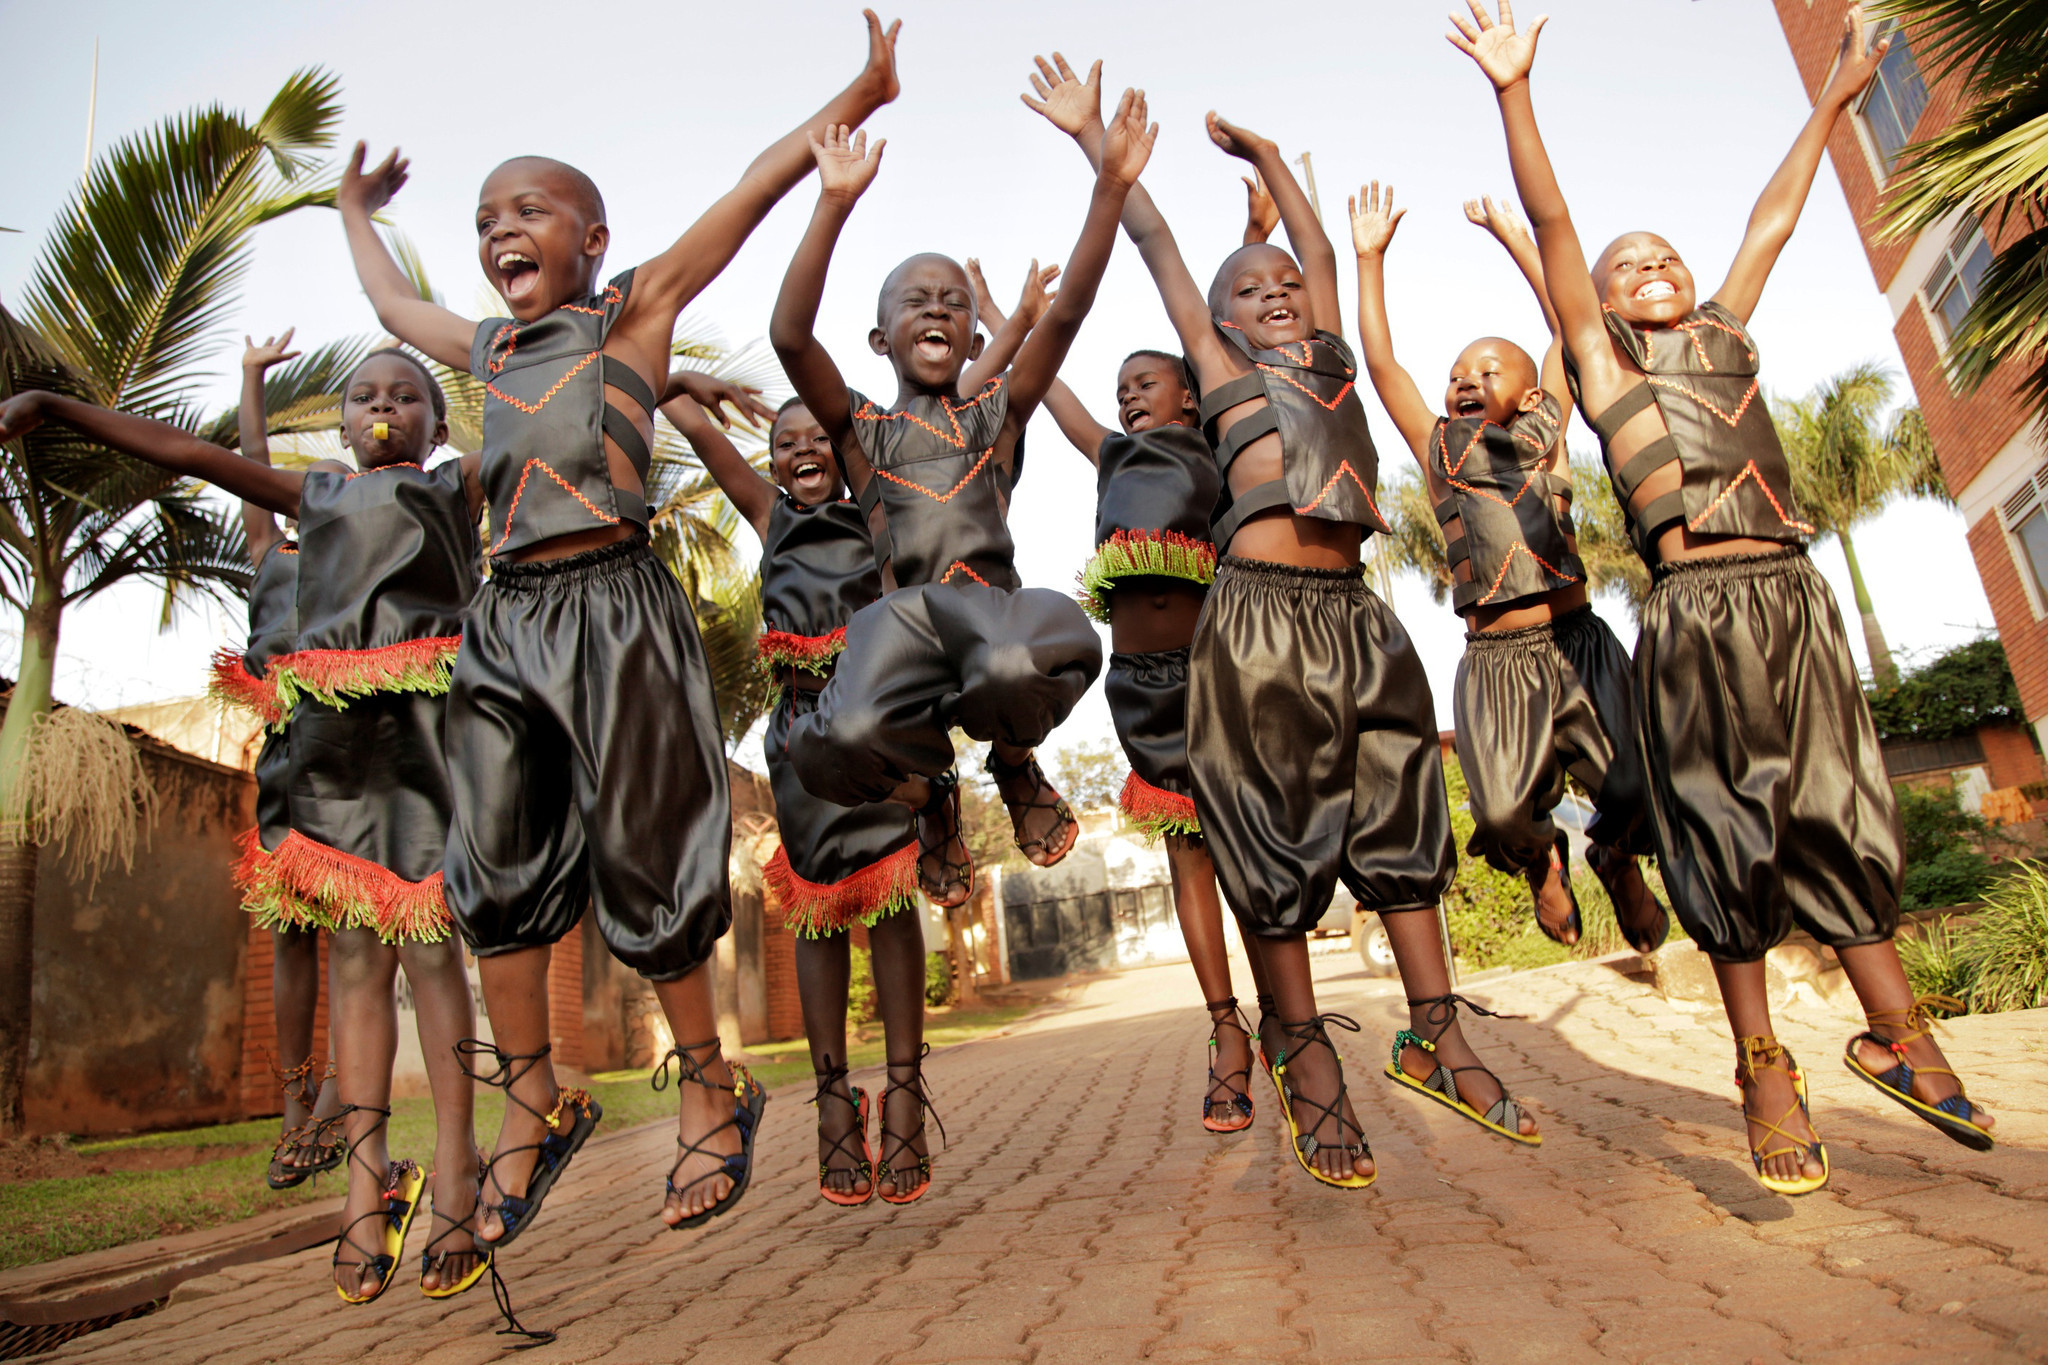 Young Zulu Children Kids Singing Dance Group Entertain